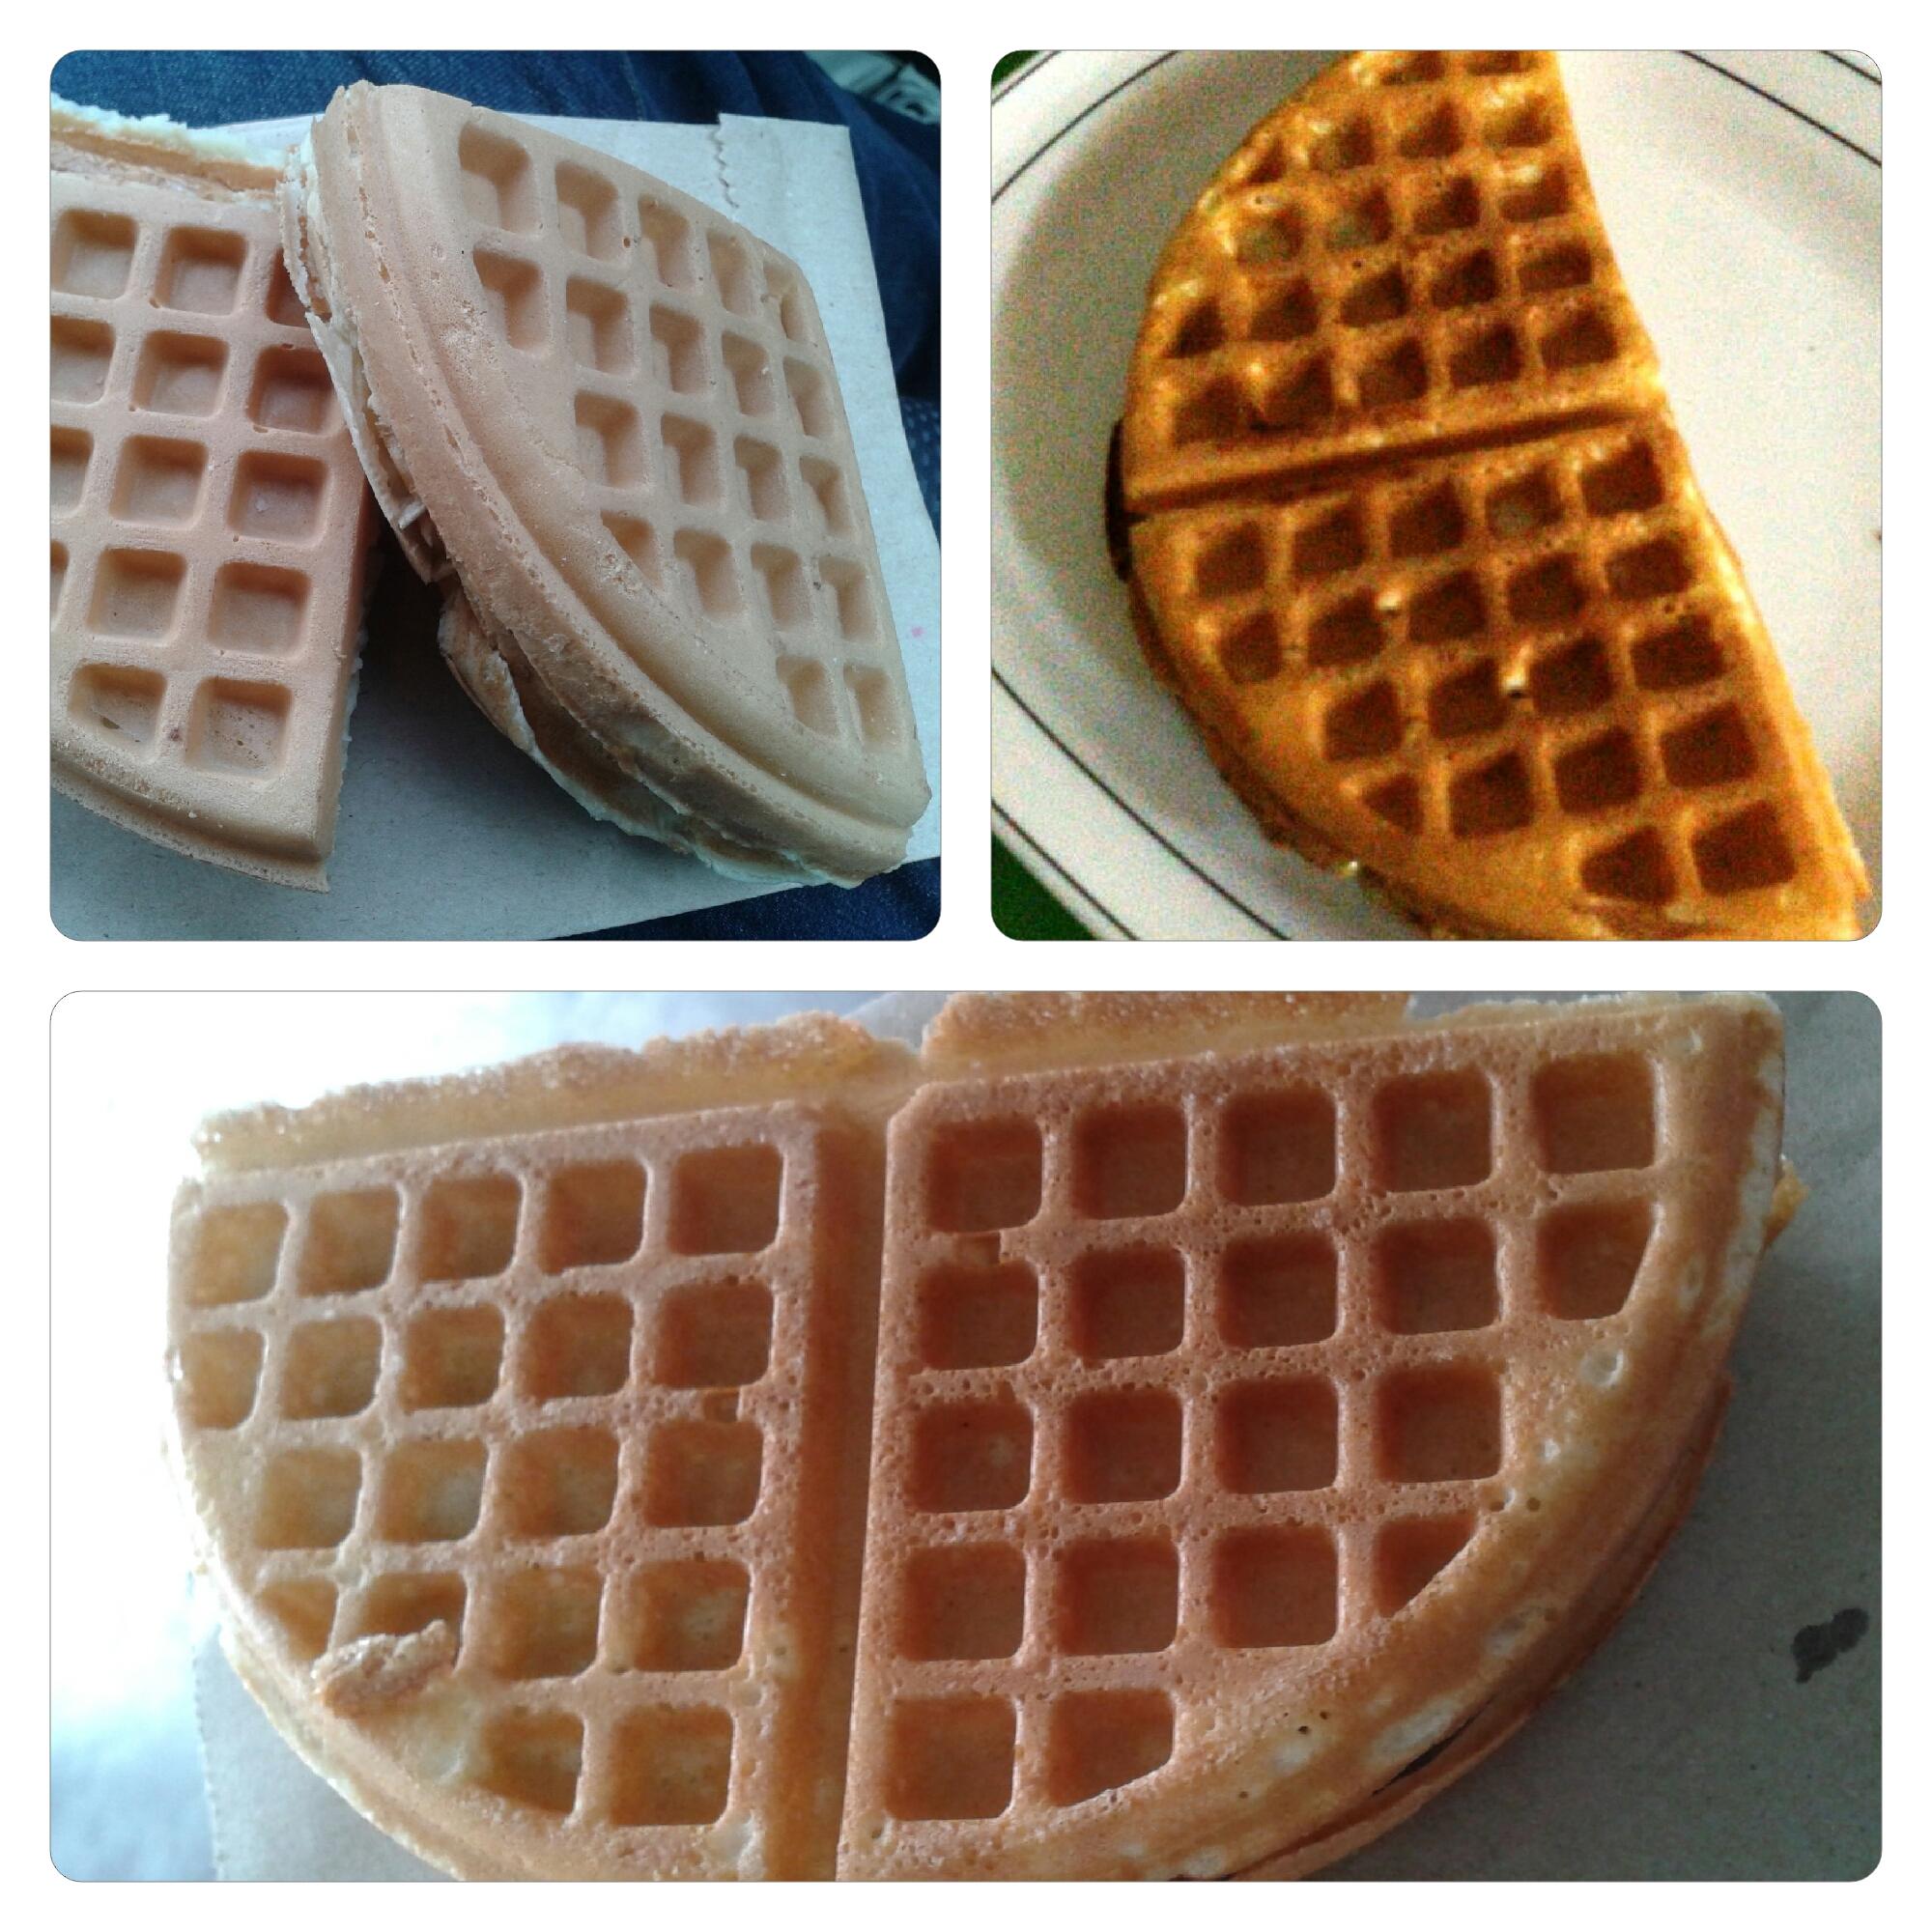 Resepi Waffle Rangup Tanpa Telur Resepikek Camored Com